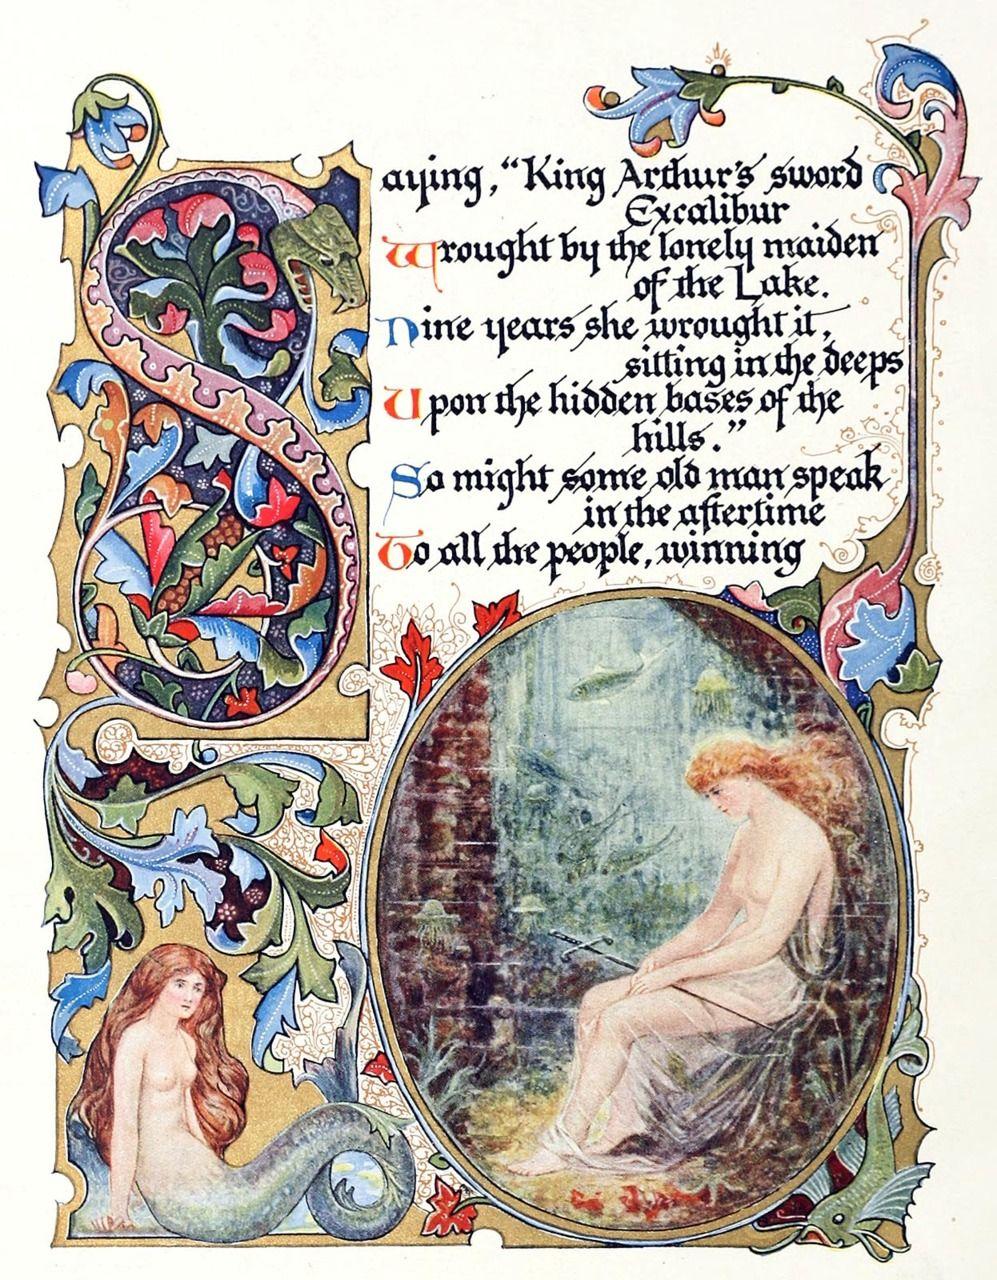 Alberto Sangorski, from Morte d'Arthur by Alfred, Lord Tennyson, London, 1912